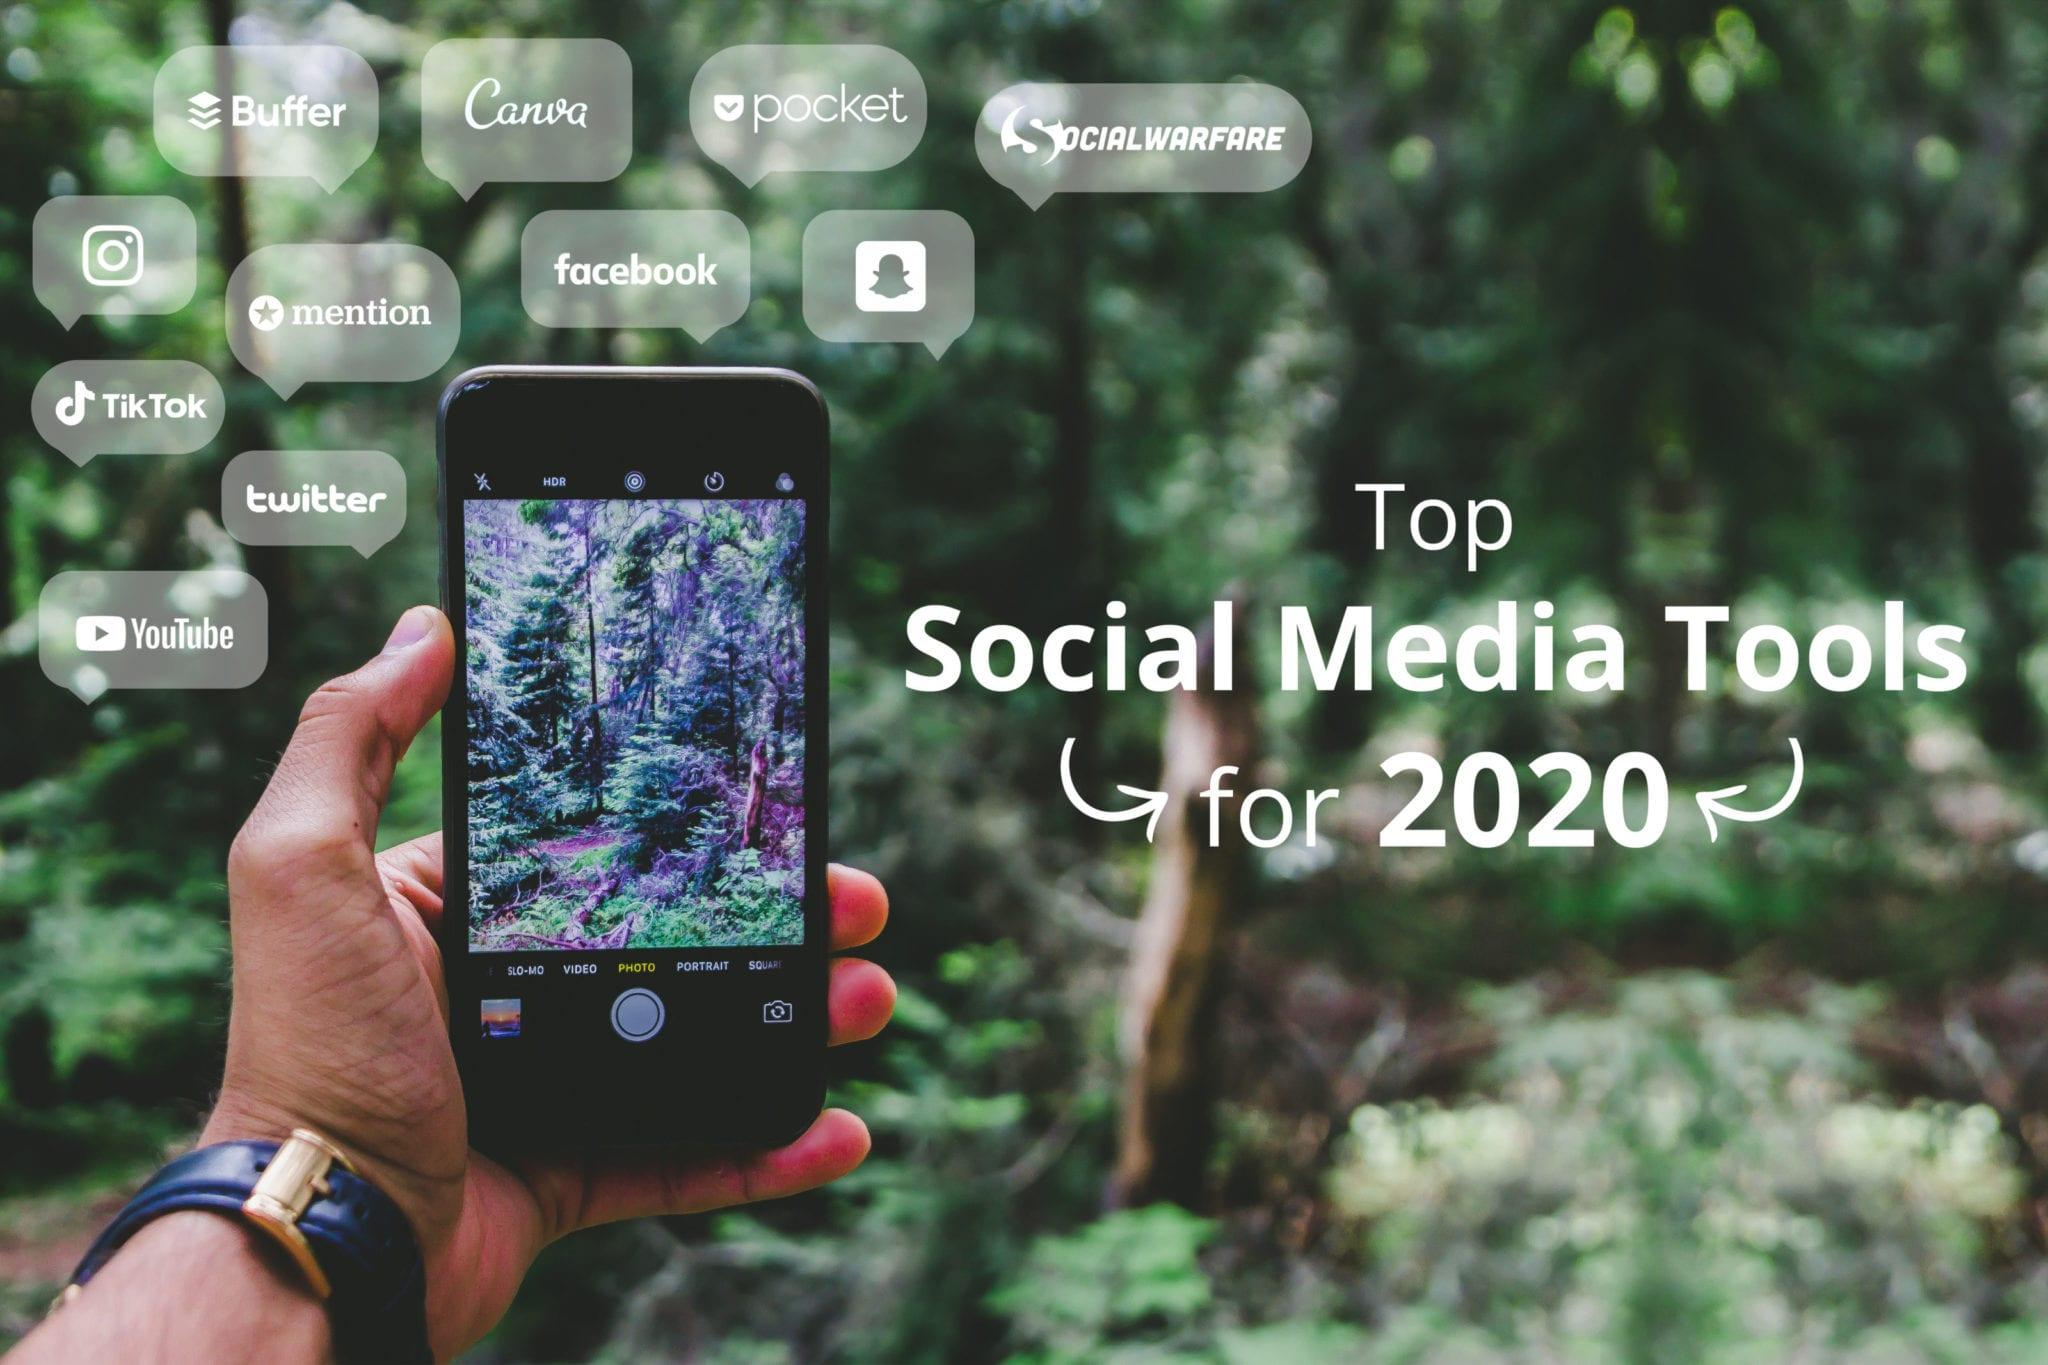 Social Media Tools for 2020